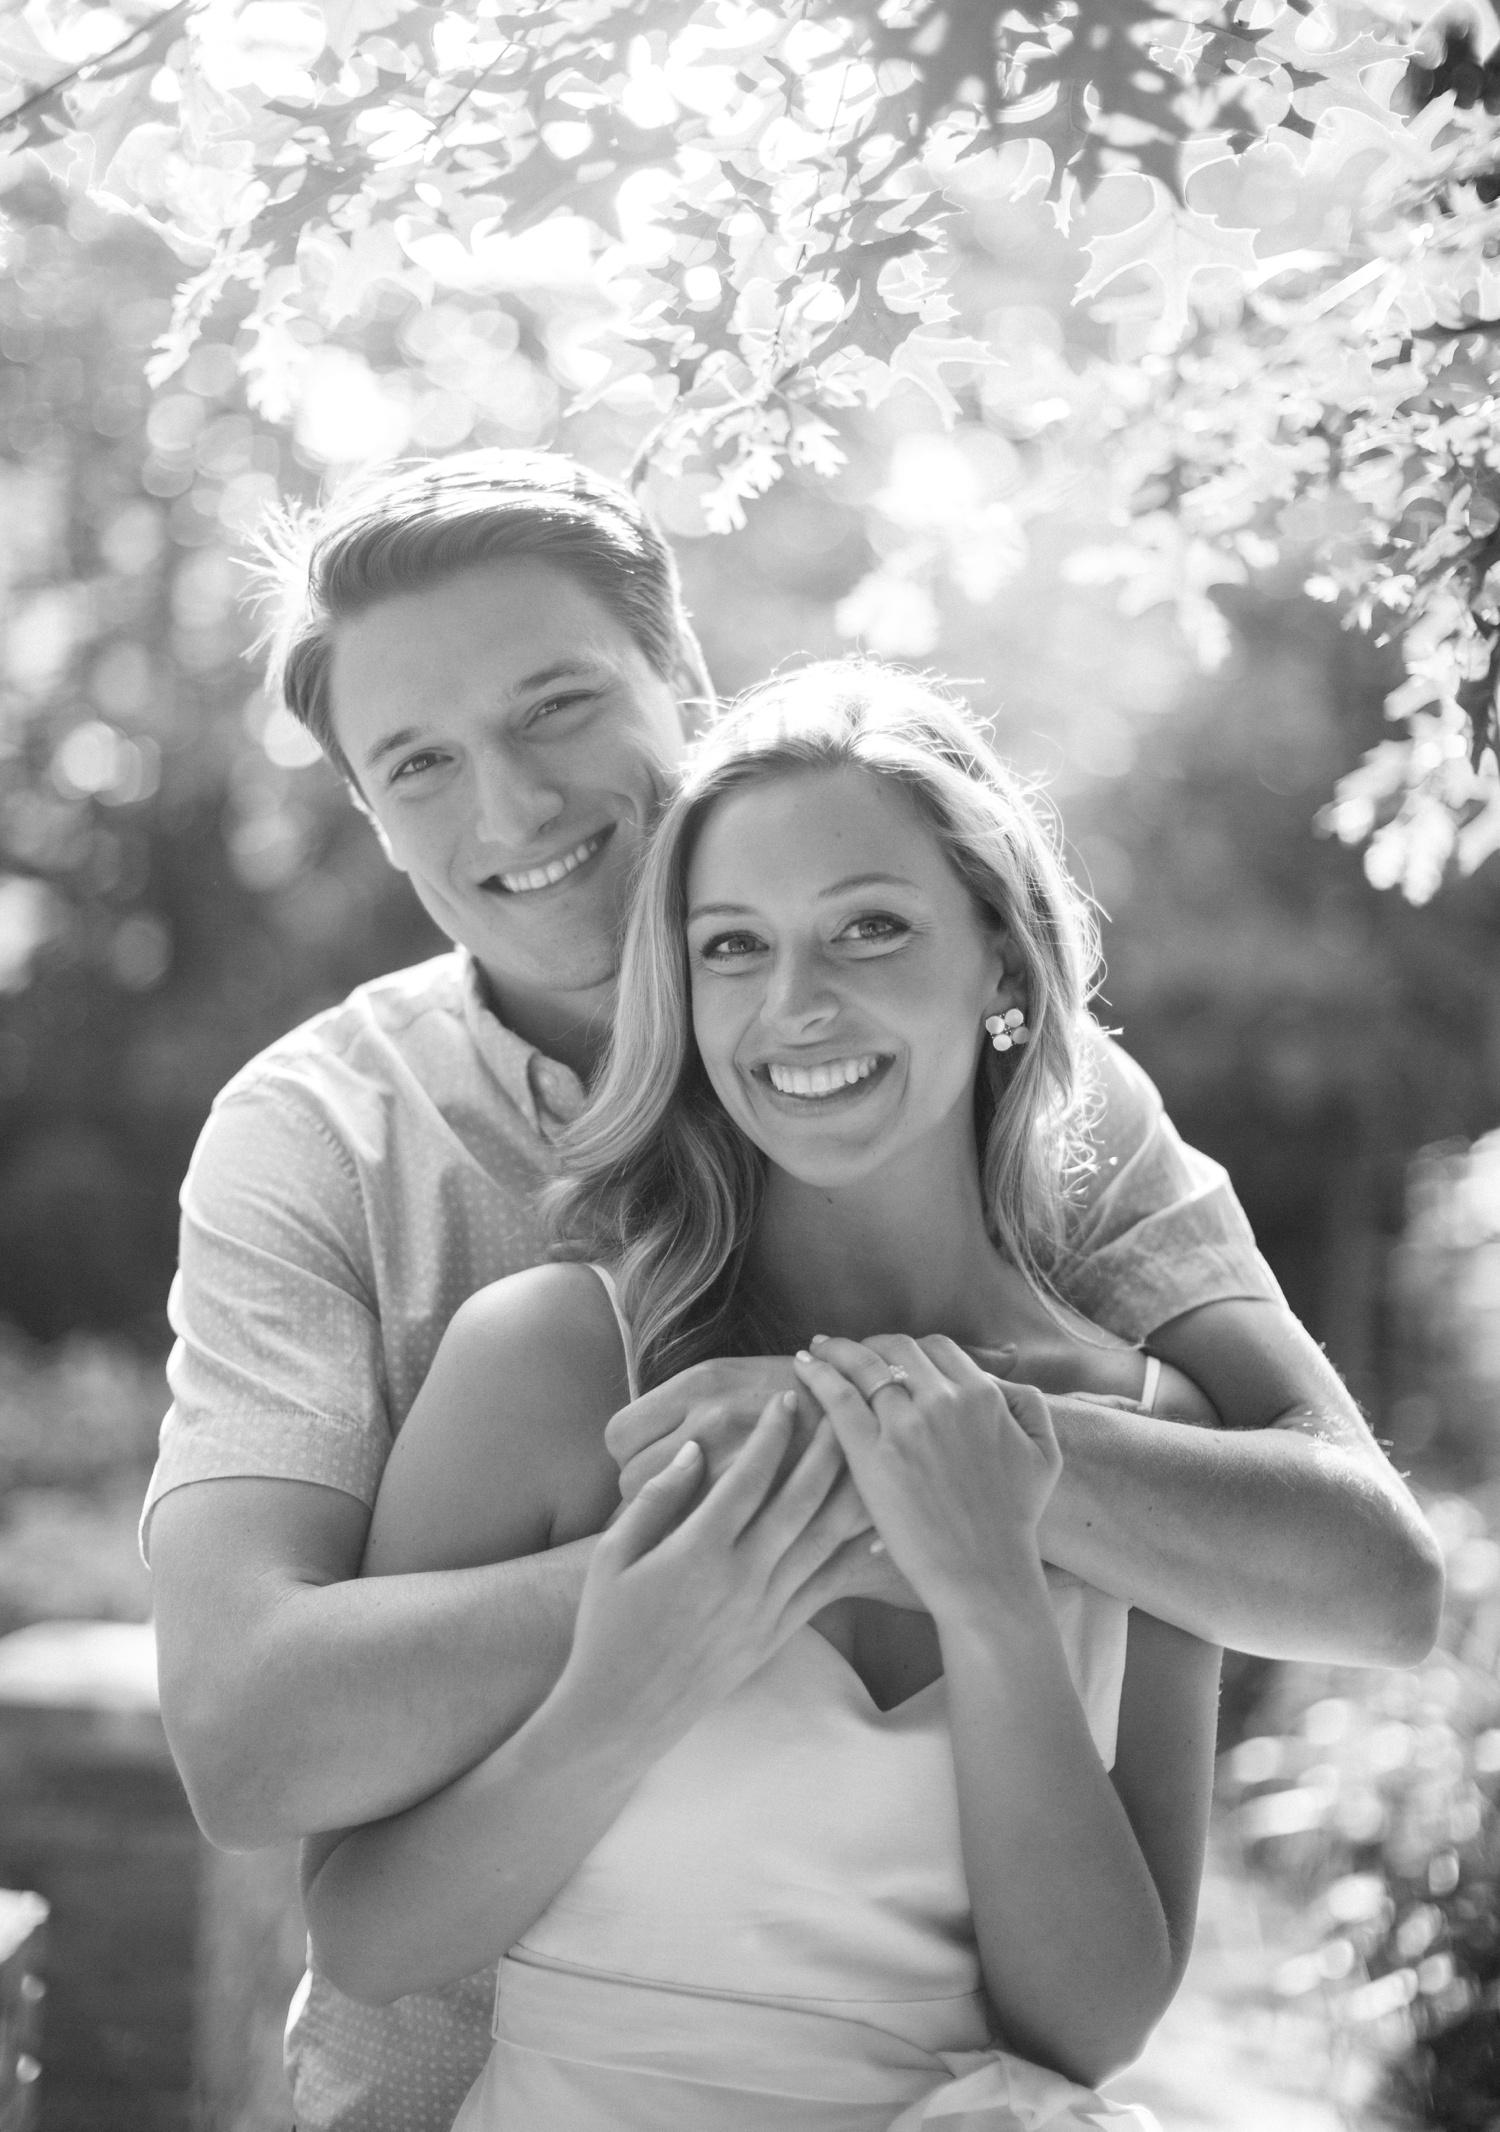 dating Lab Washington Post edru singler online dating